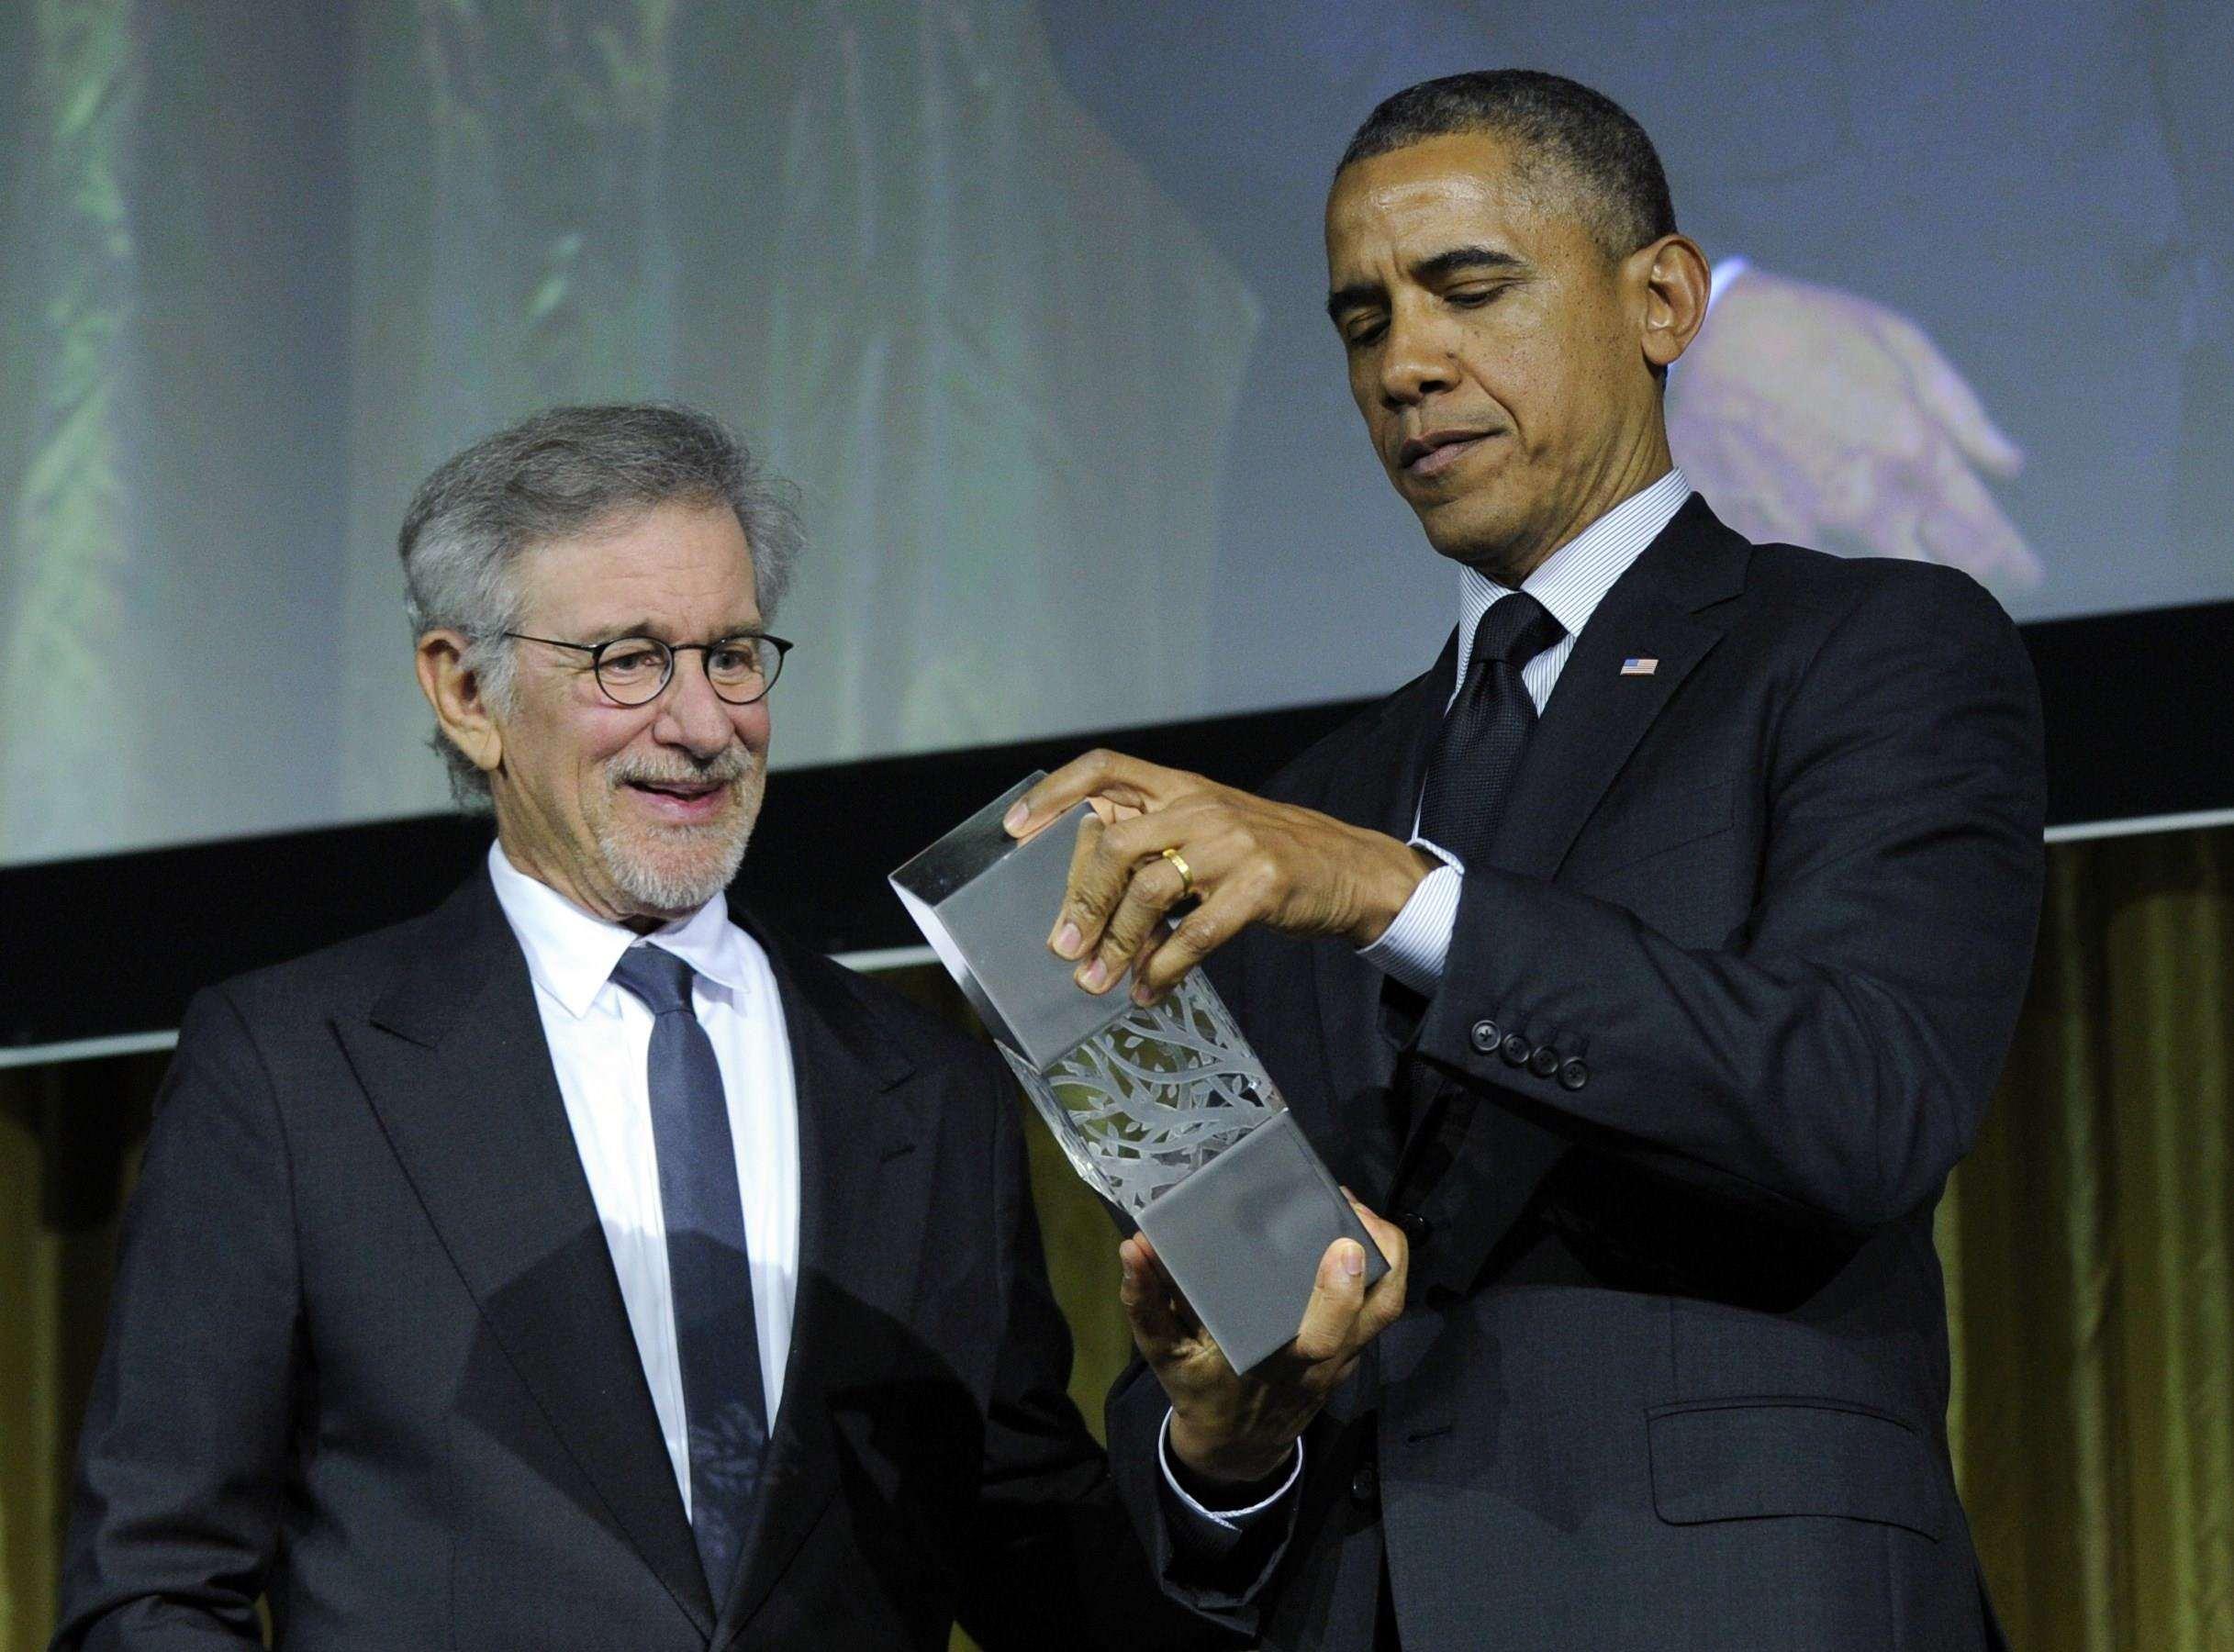 Spielberg Praises Obama's Failed 'Atrocities Prevention Board'